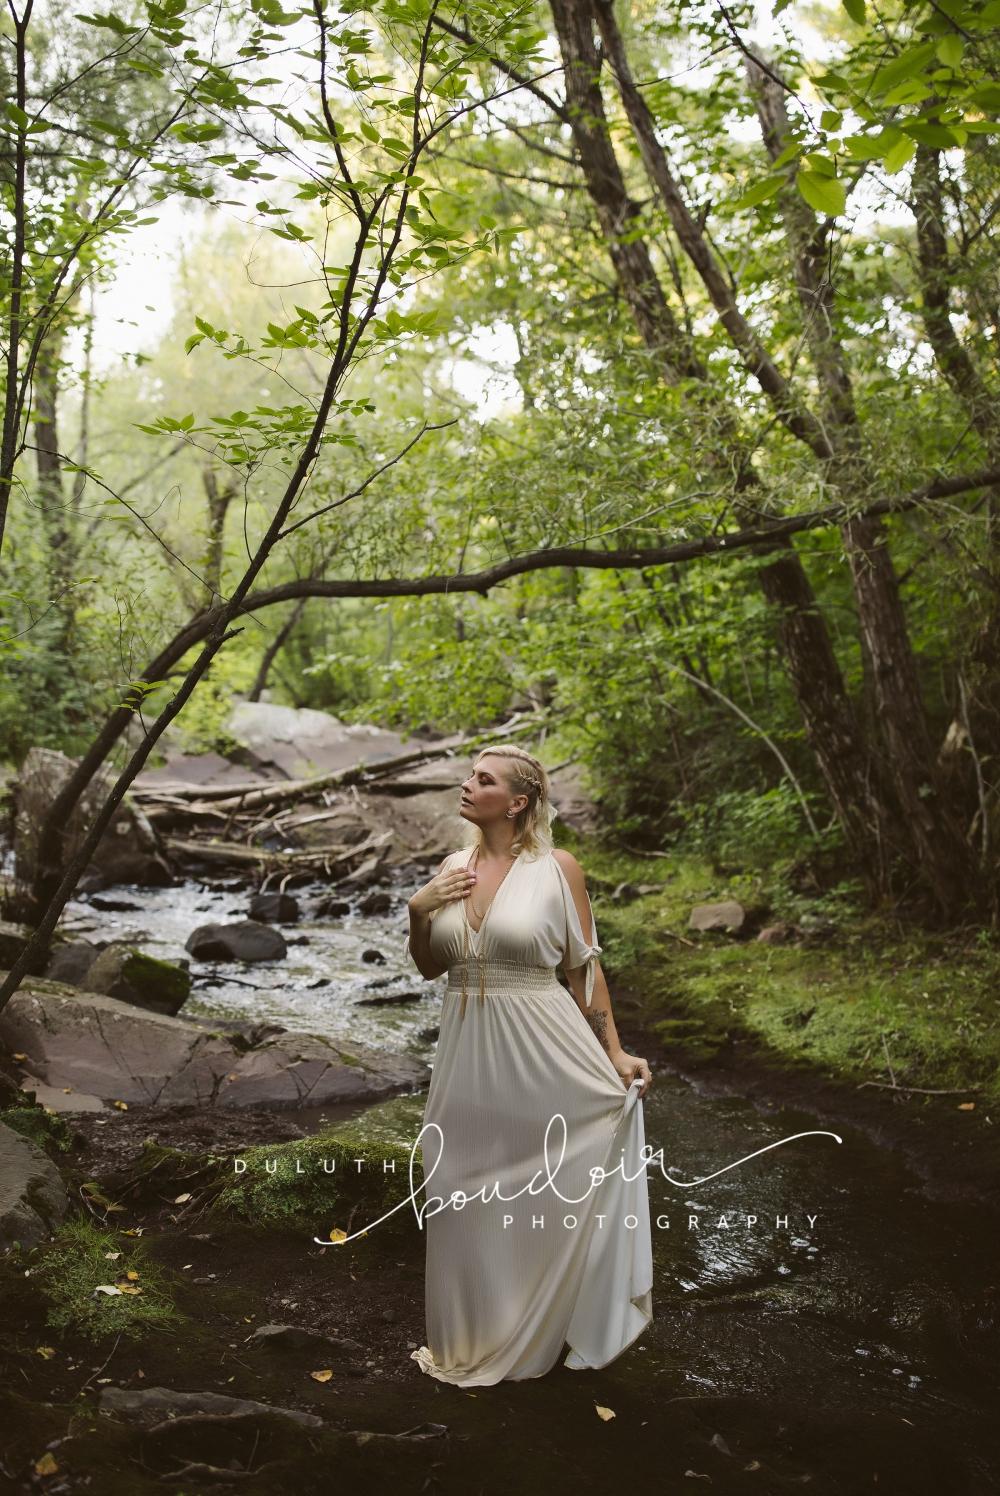 duluth-boudoir-photography-andrea-5